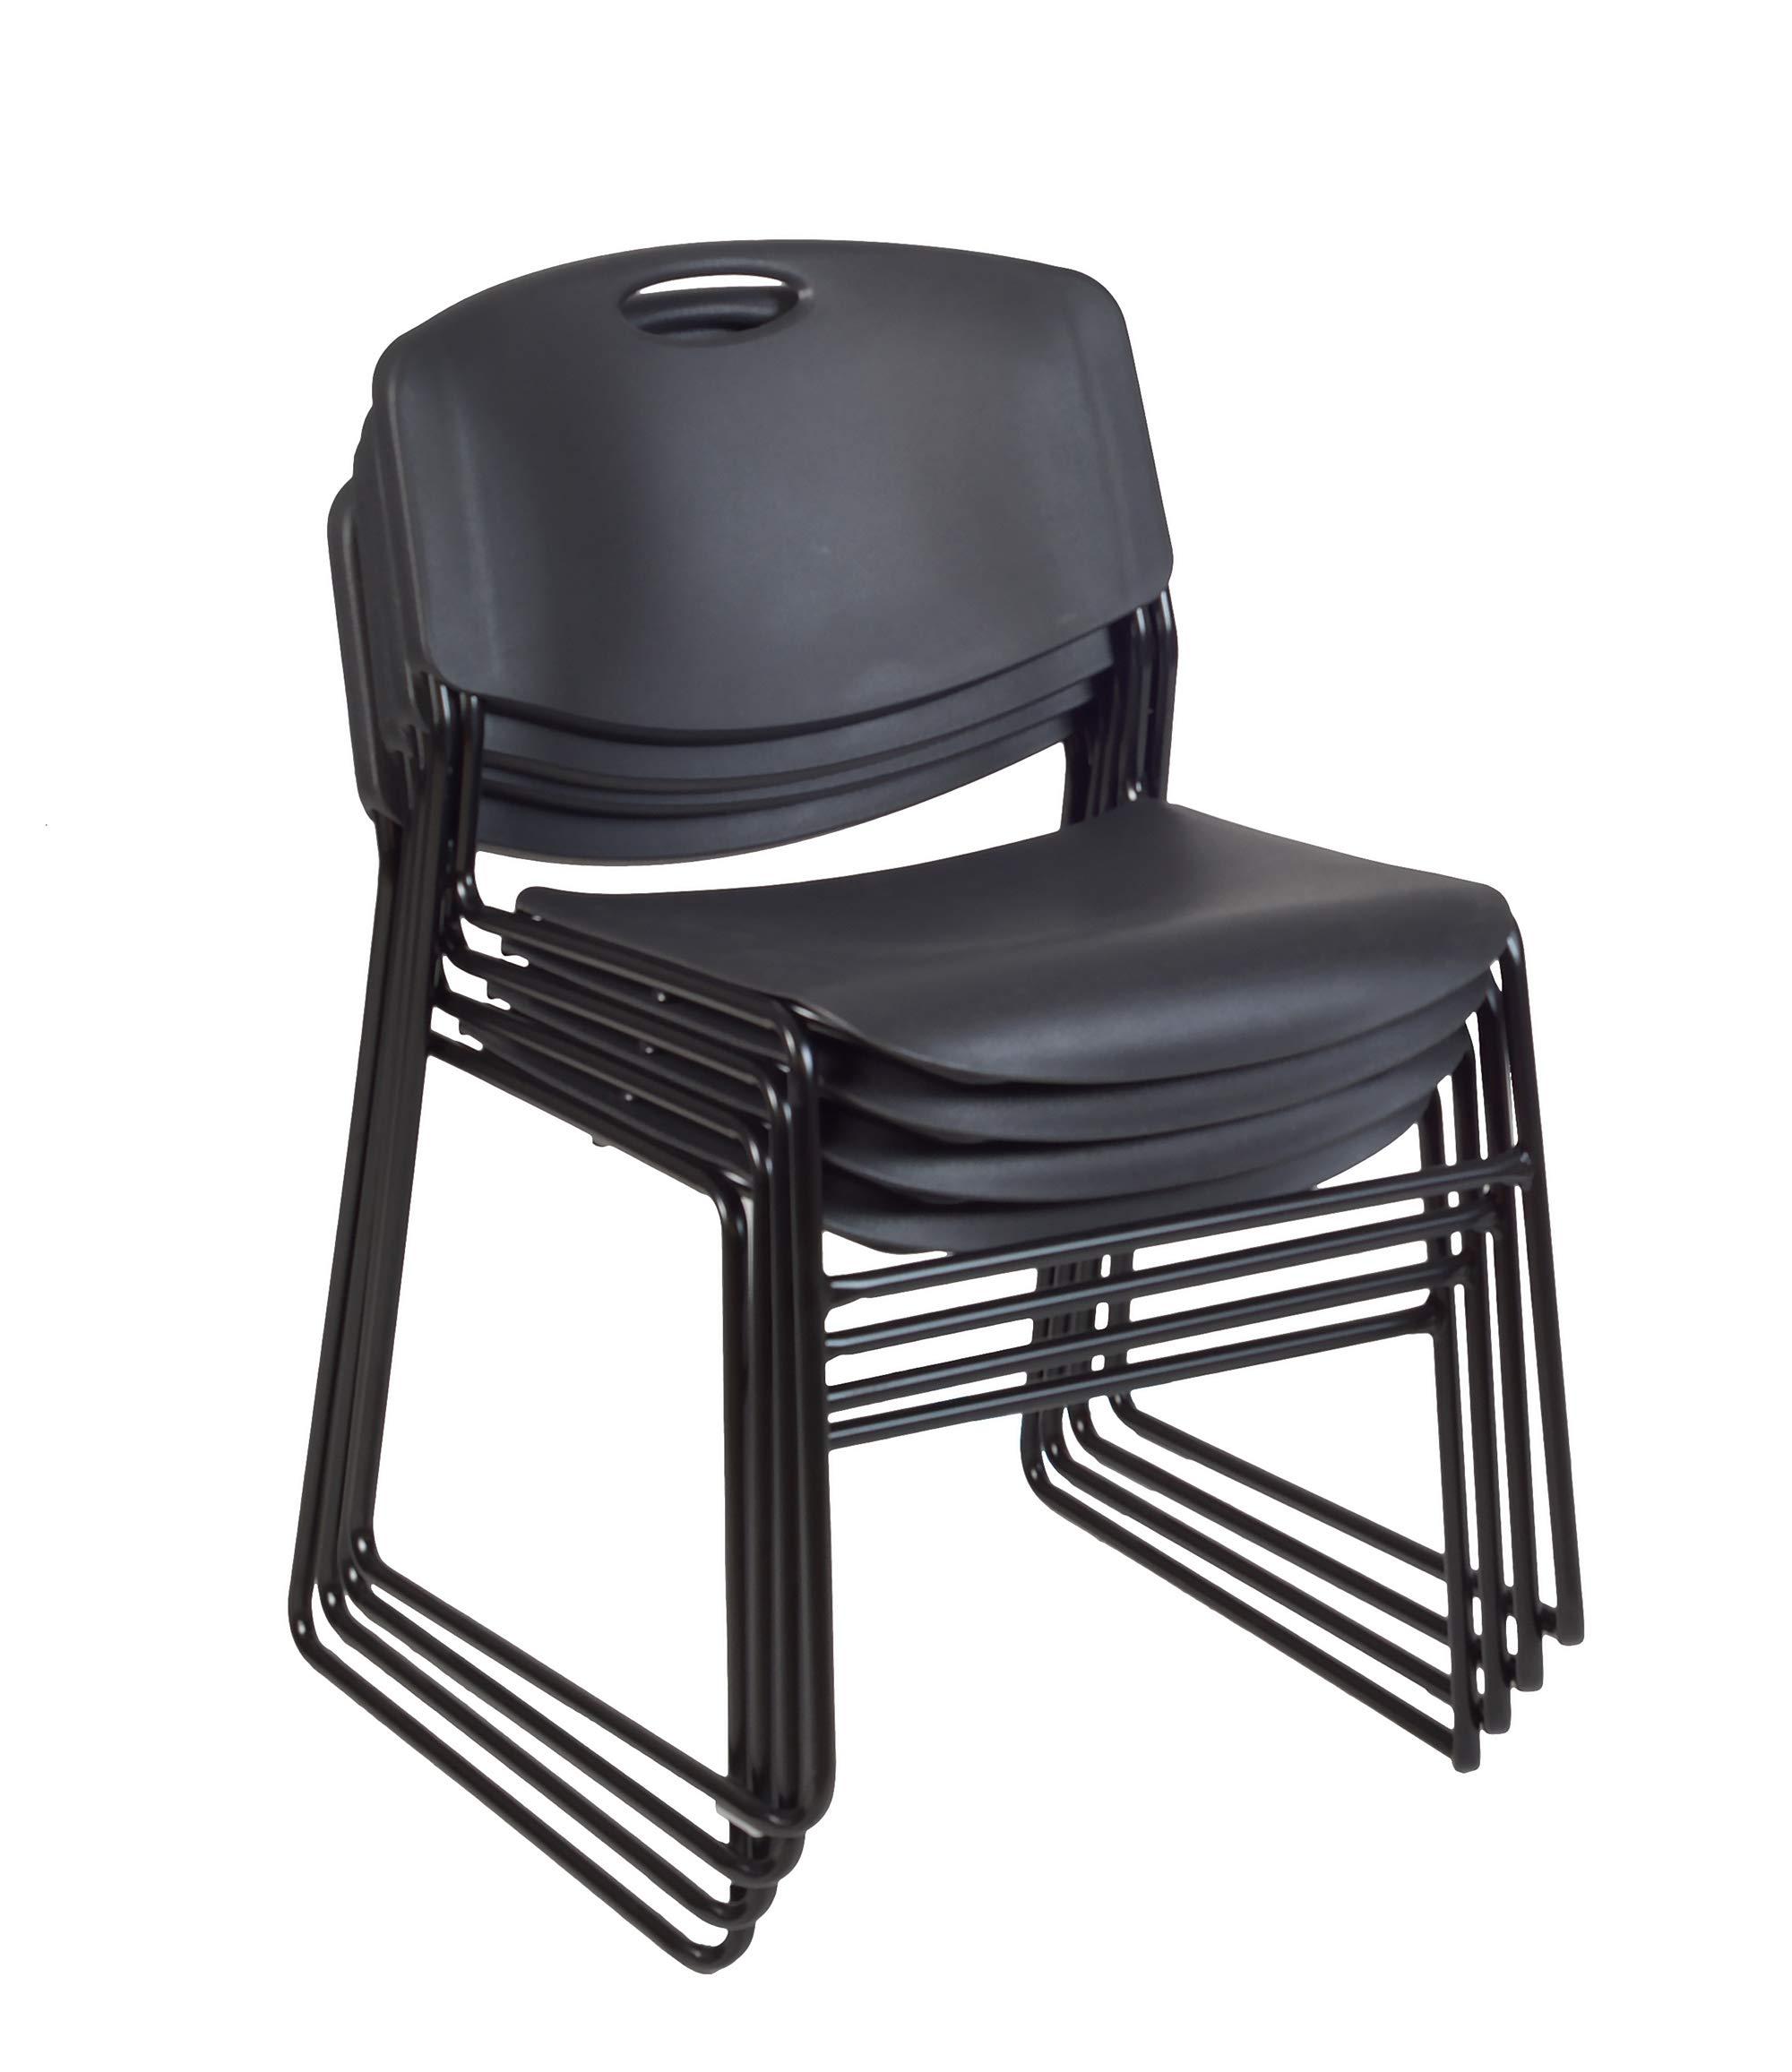 Regency Zeng Stack Chair (4 Pack), Black by Regency